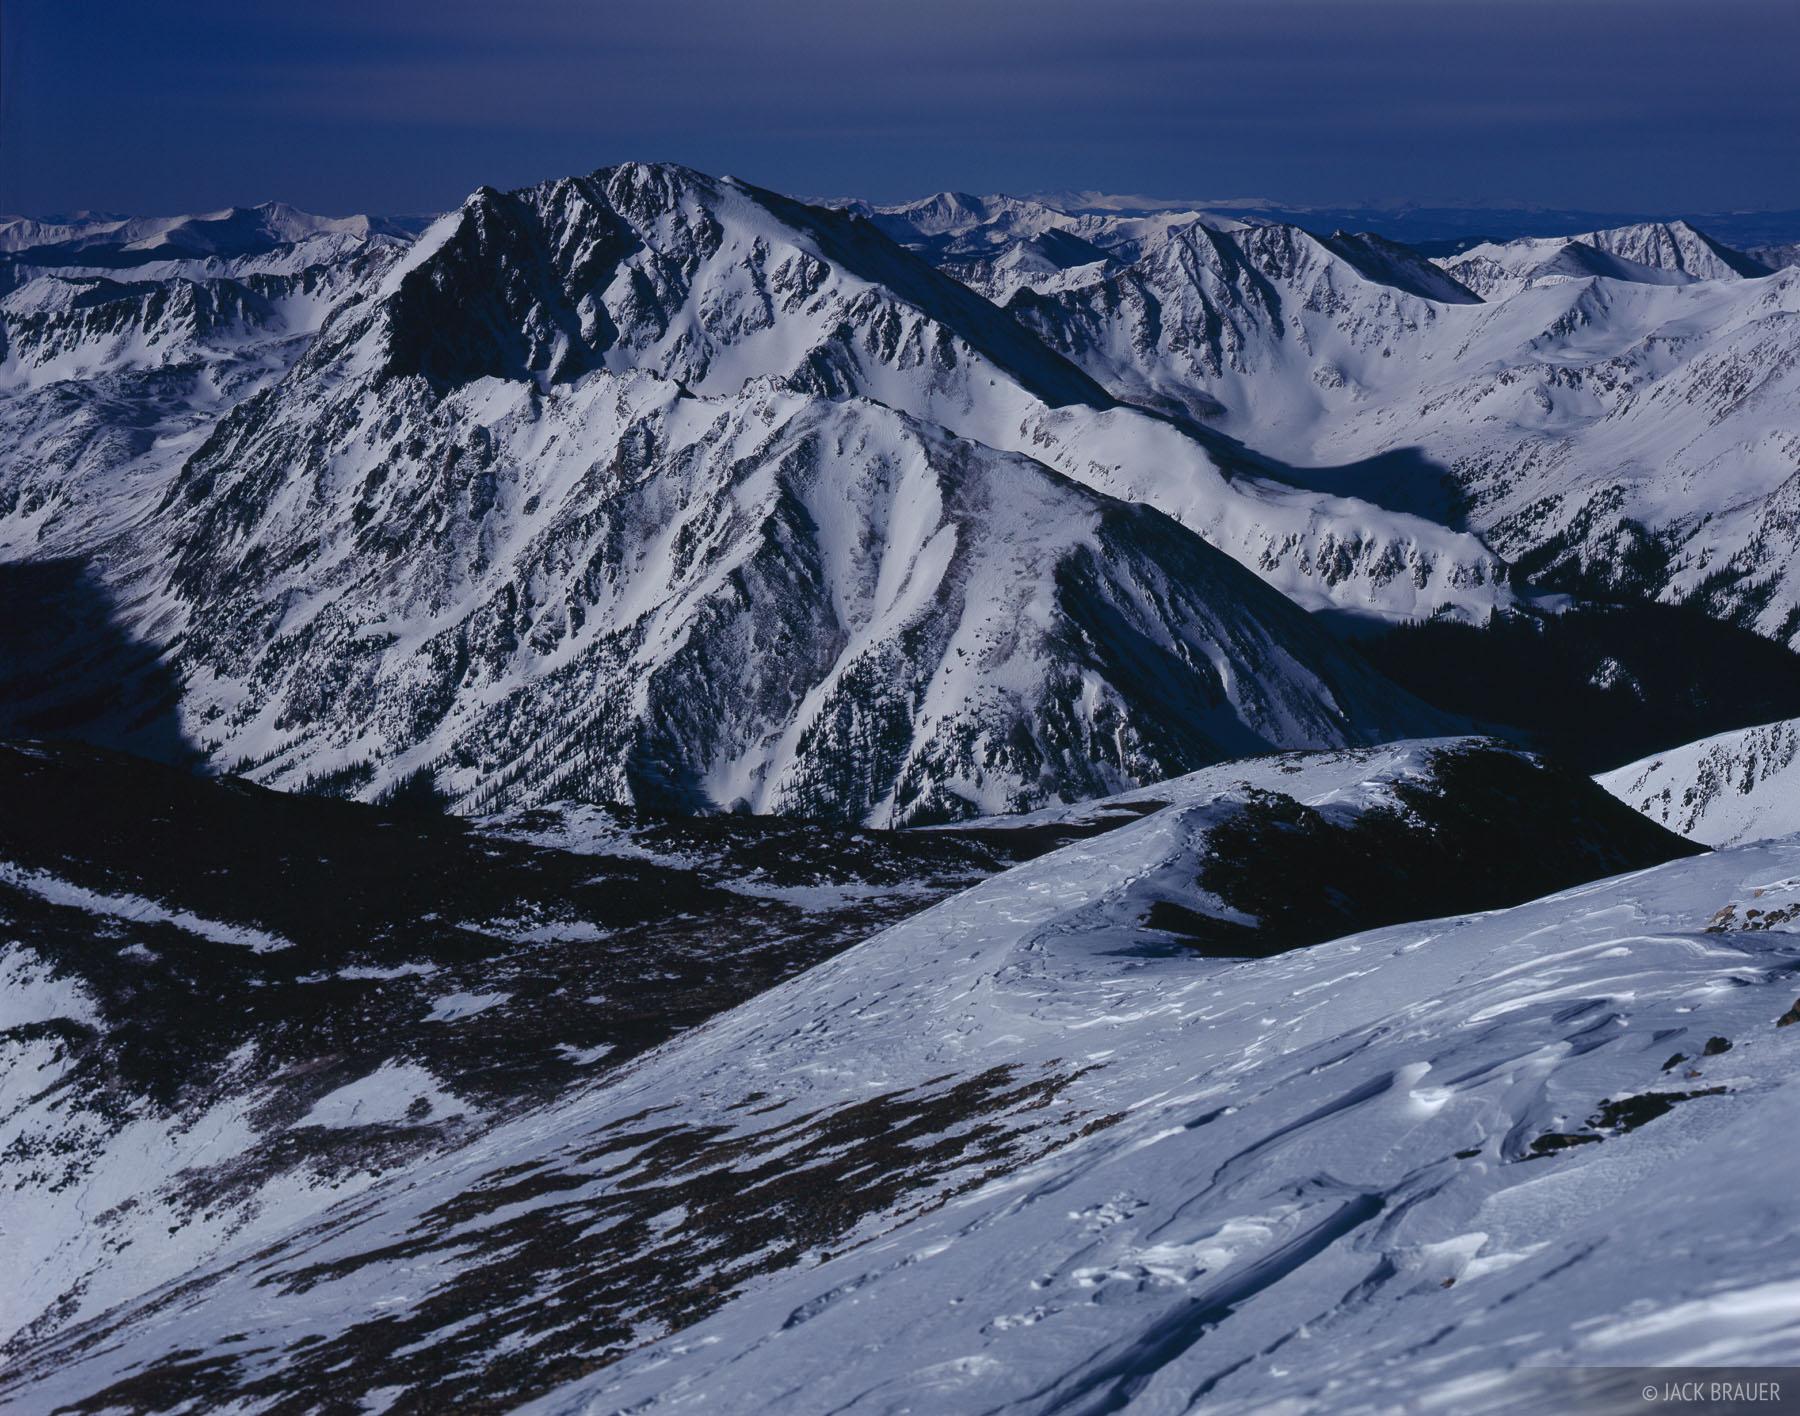 La Plata Peak illuminated by moonlight, as seen from the summit of Mt. Elbert, February 2008. La Plata Peak is Colorado...